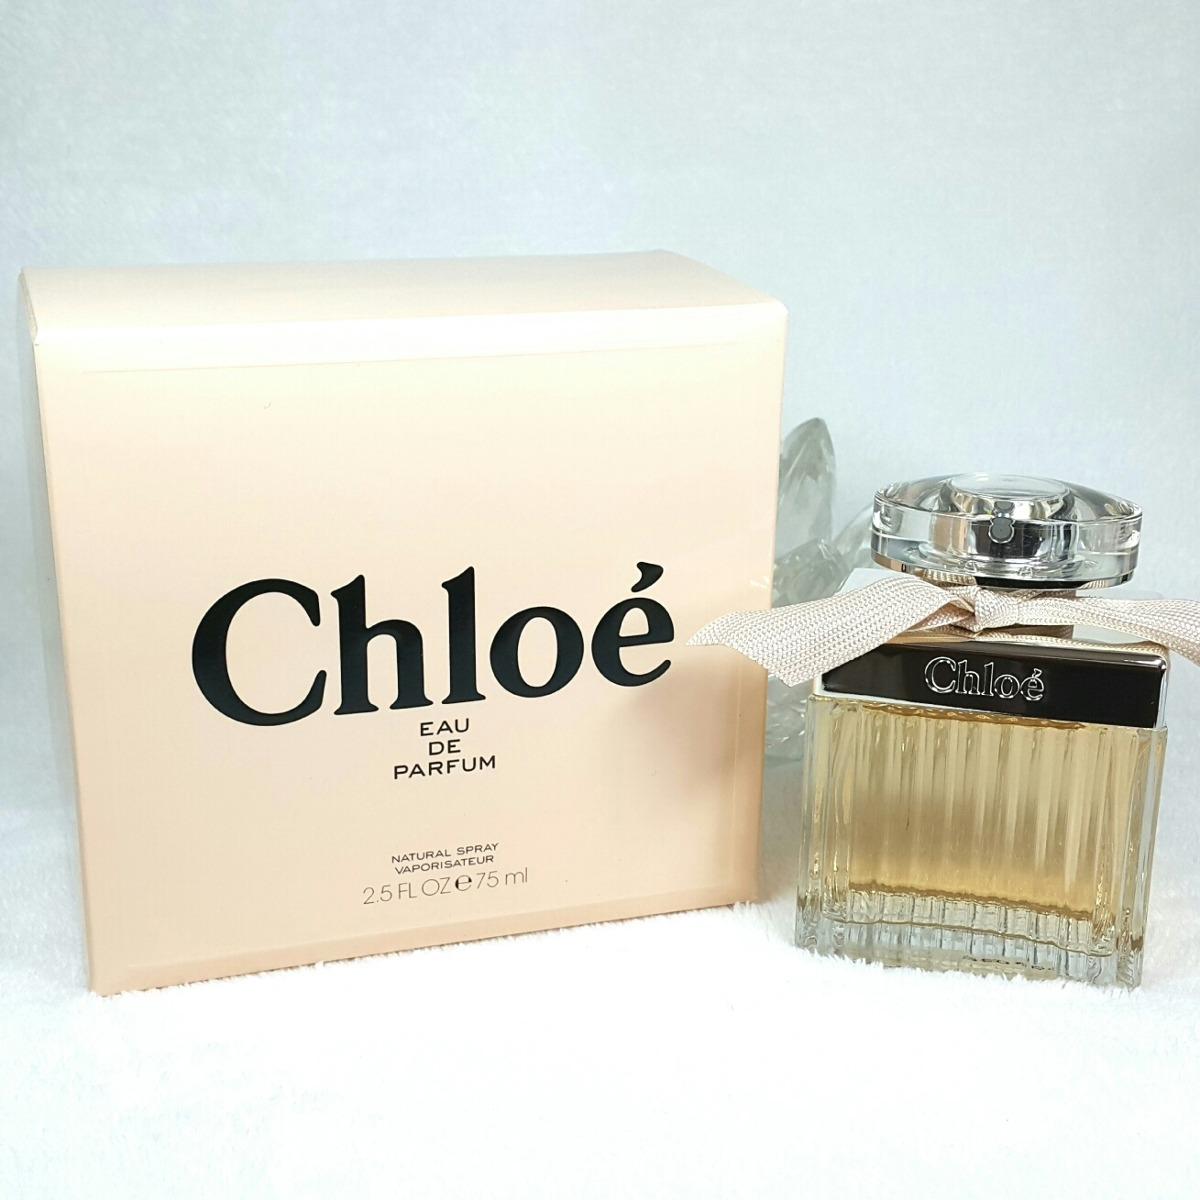 Perfume Chloé 75ml Eau De Parfum Made In France Frete Grátis R